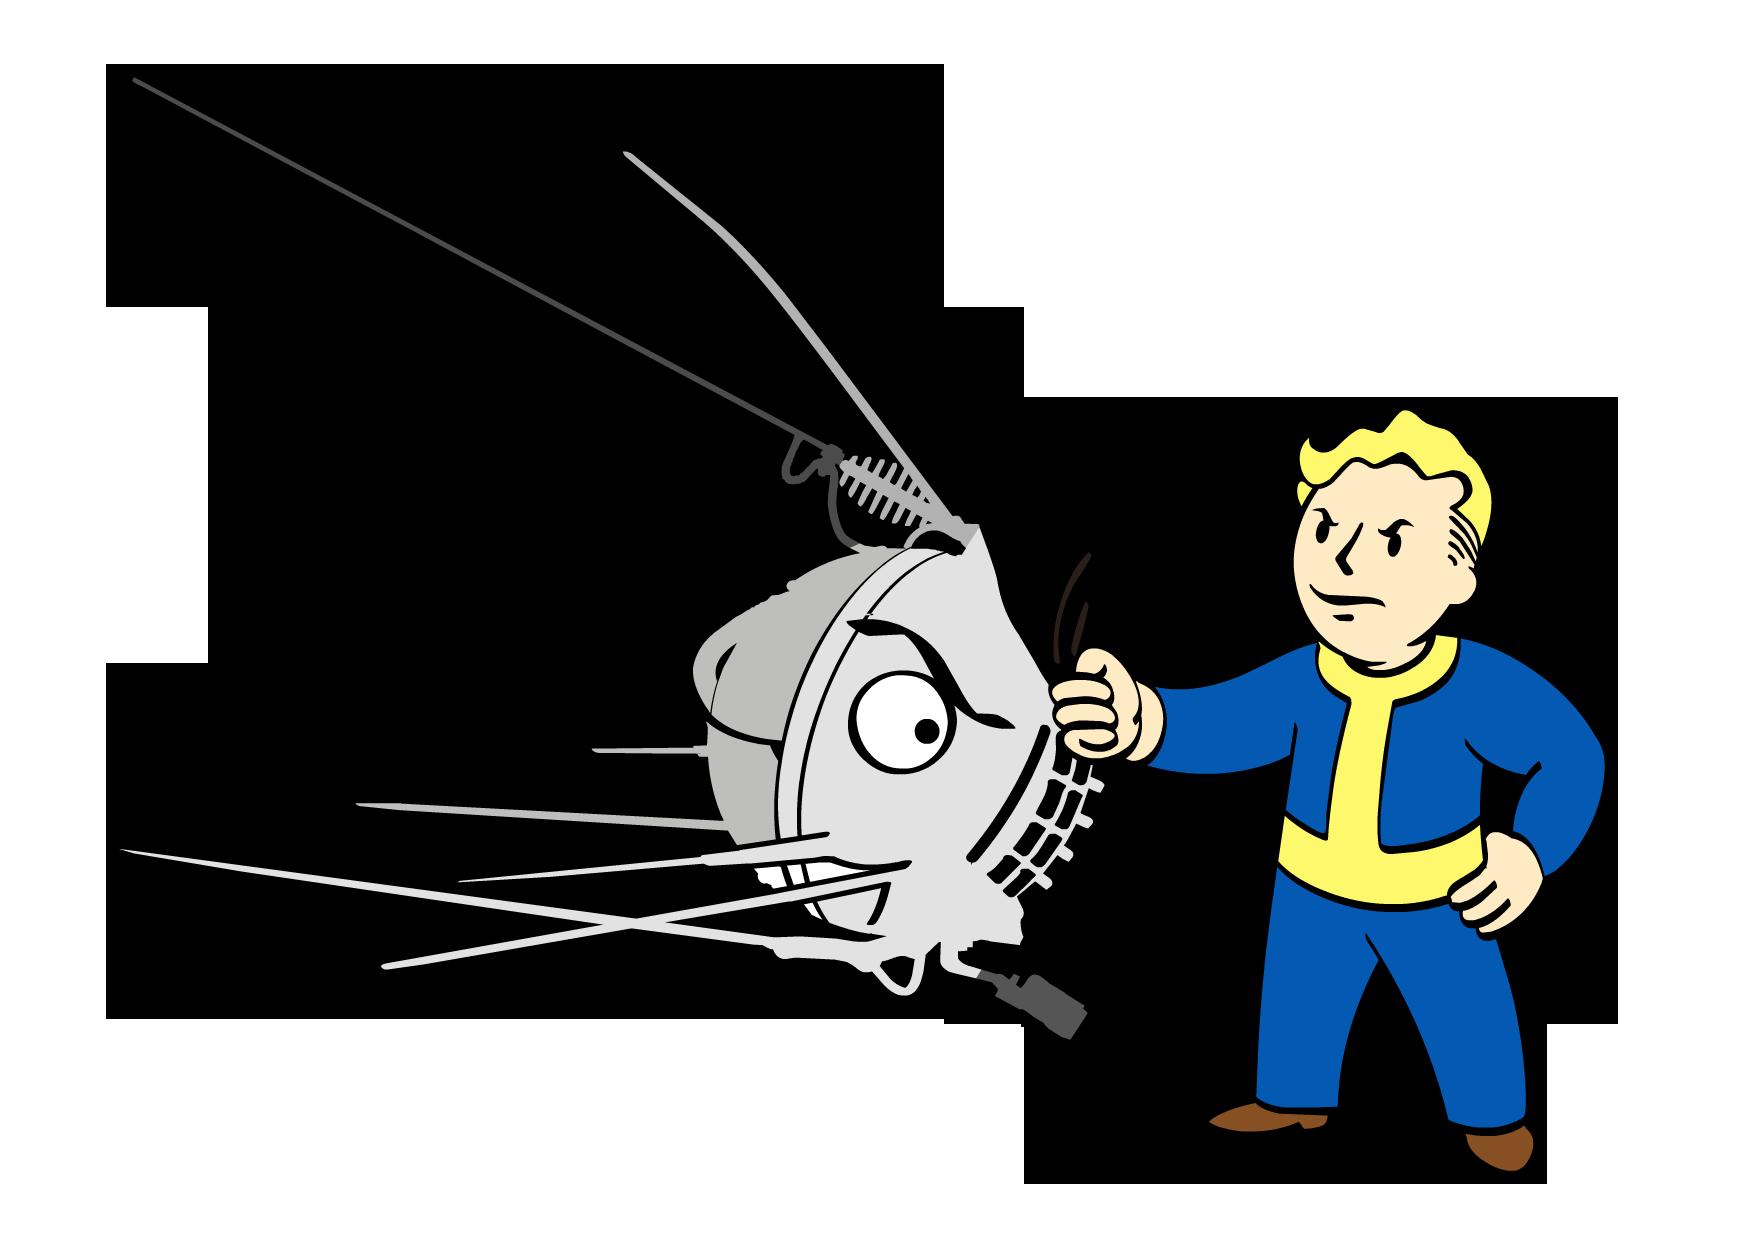 Menace fallout wiki fandom. Mechanic clipart mechanical force